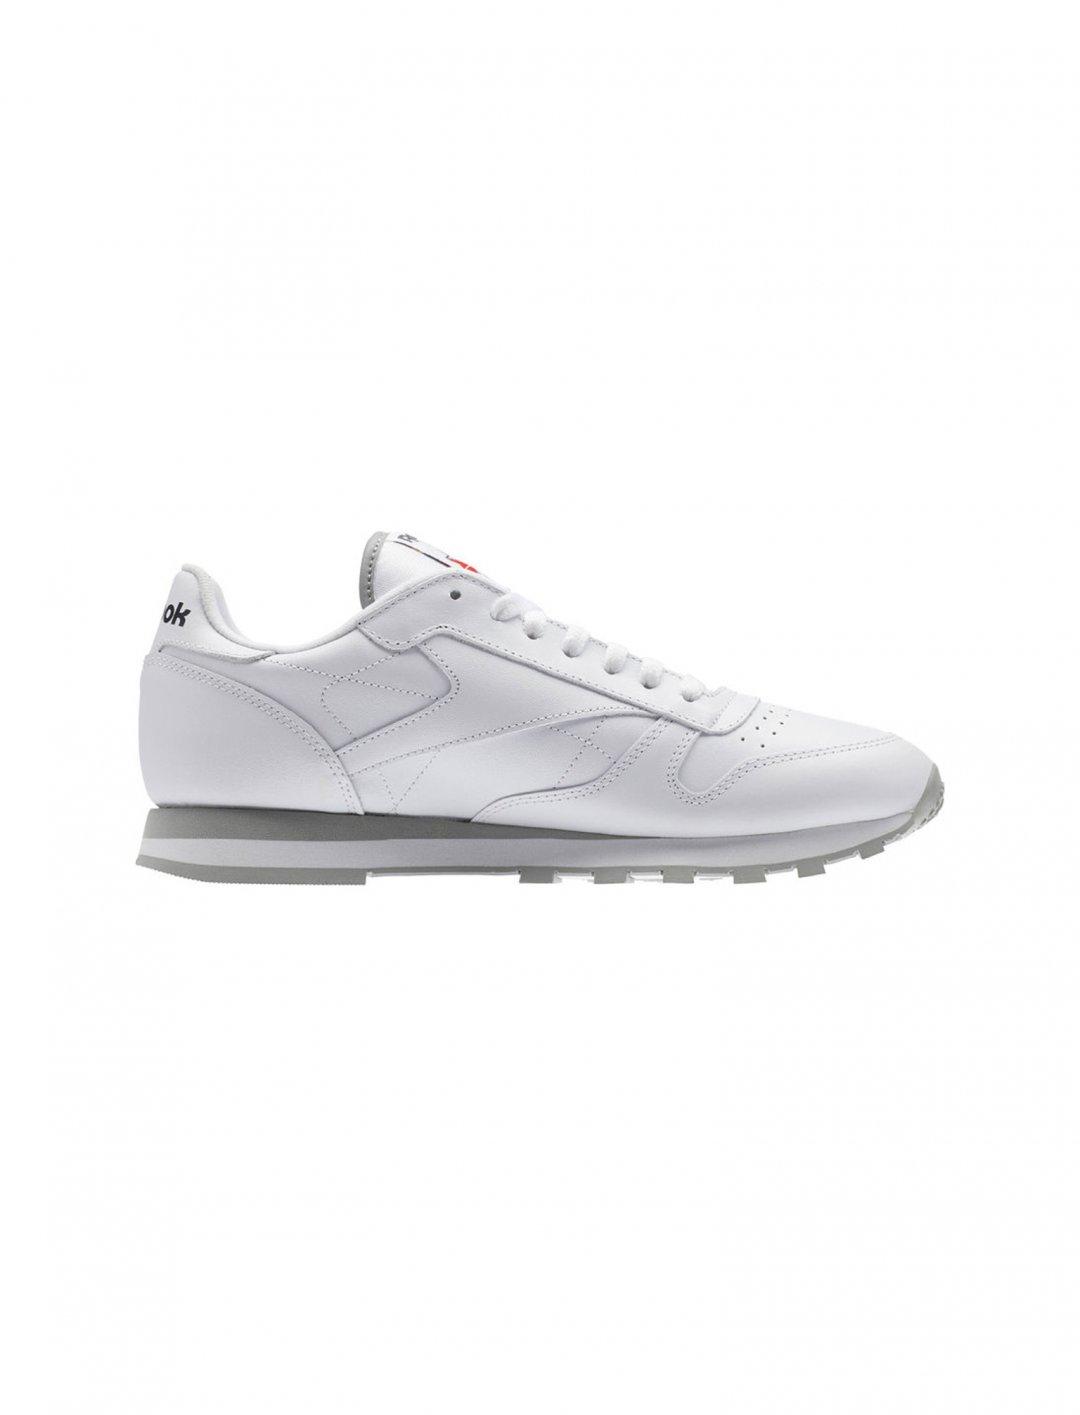 Reebok Sneakers Shoes Reebok